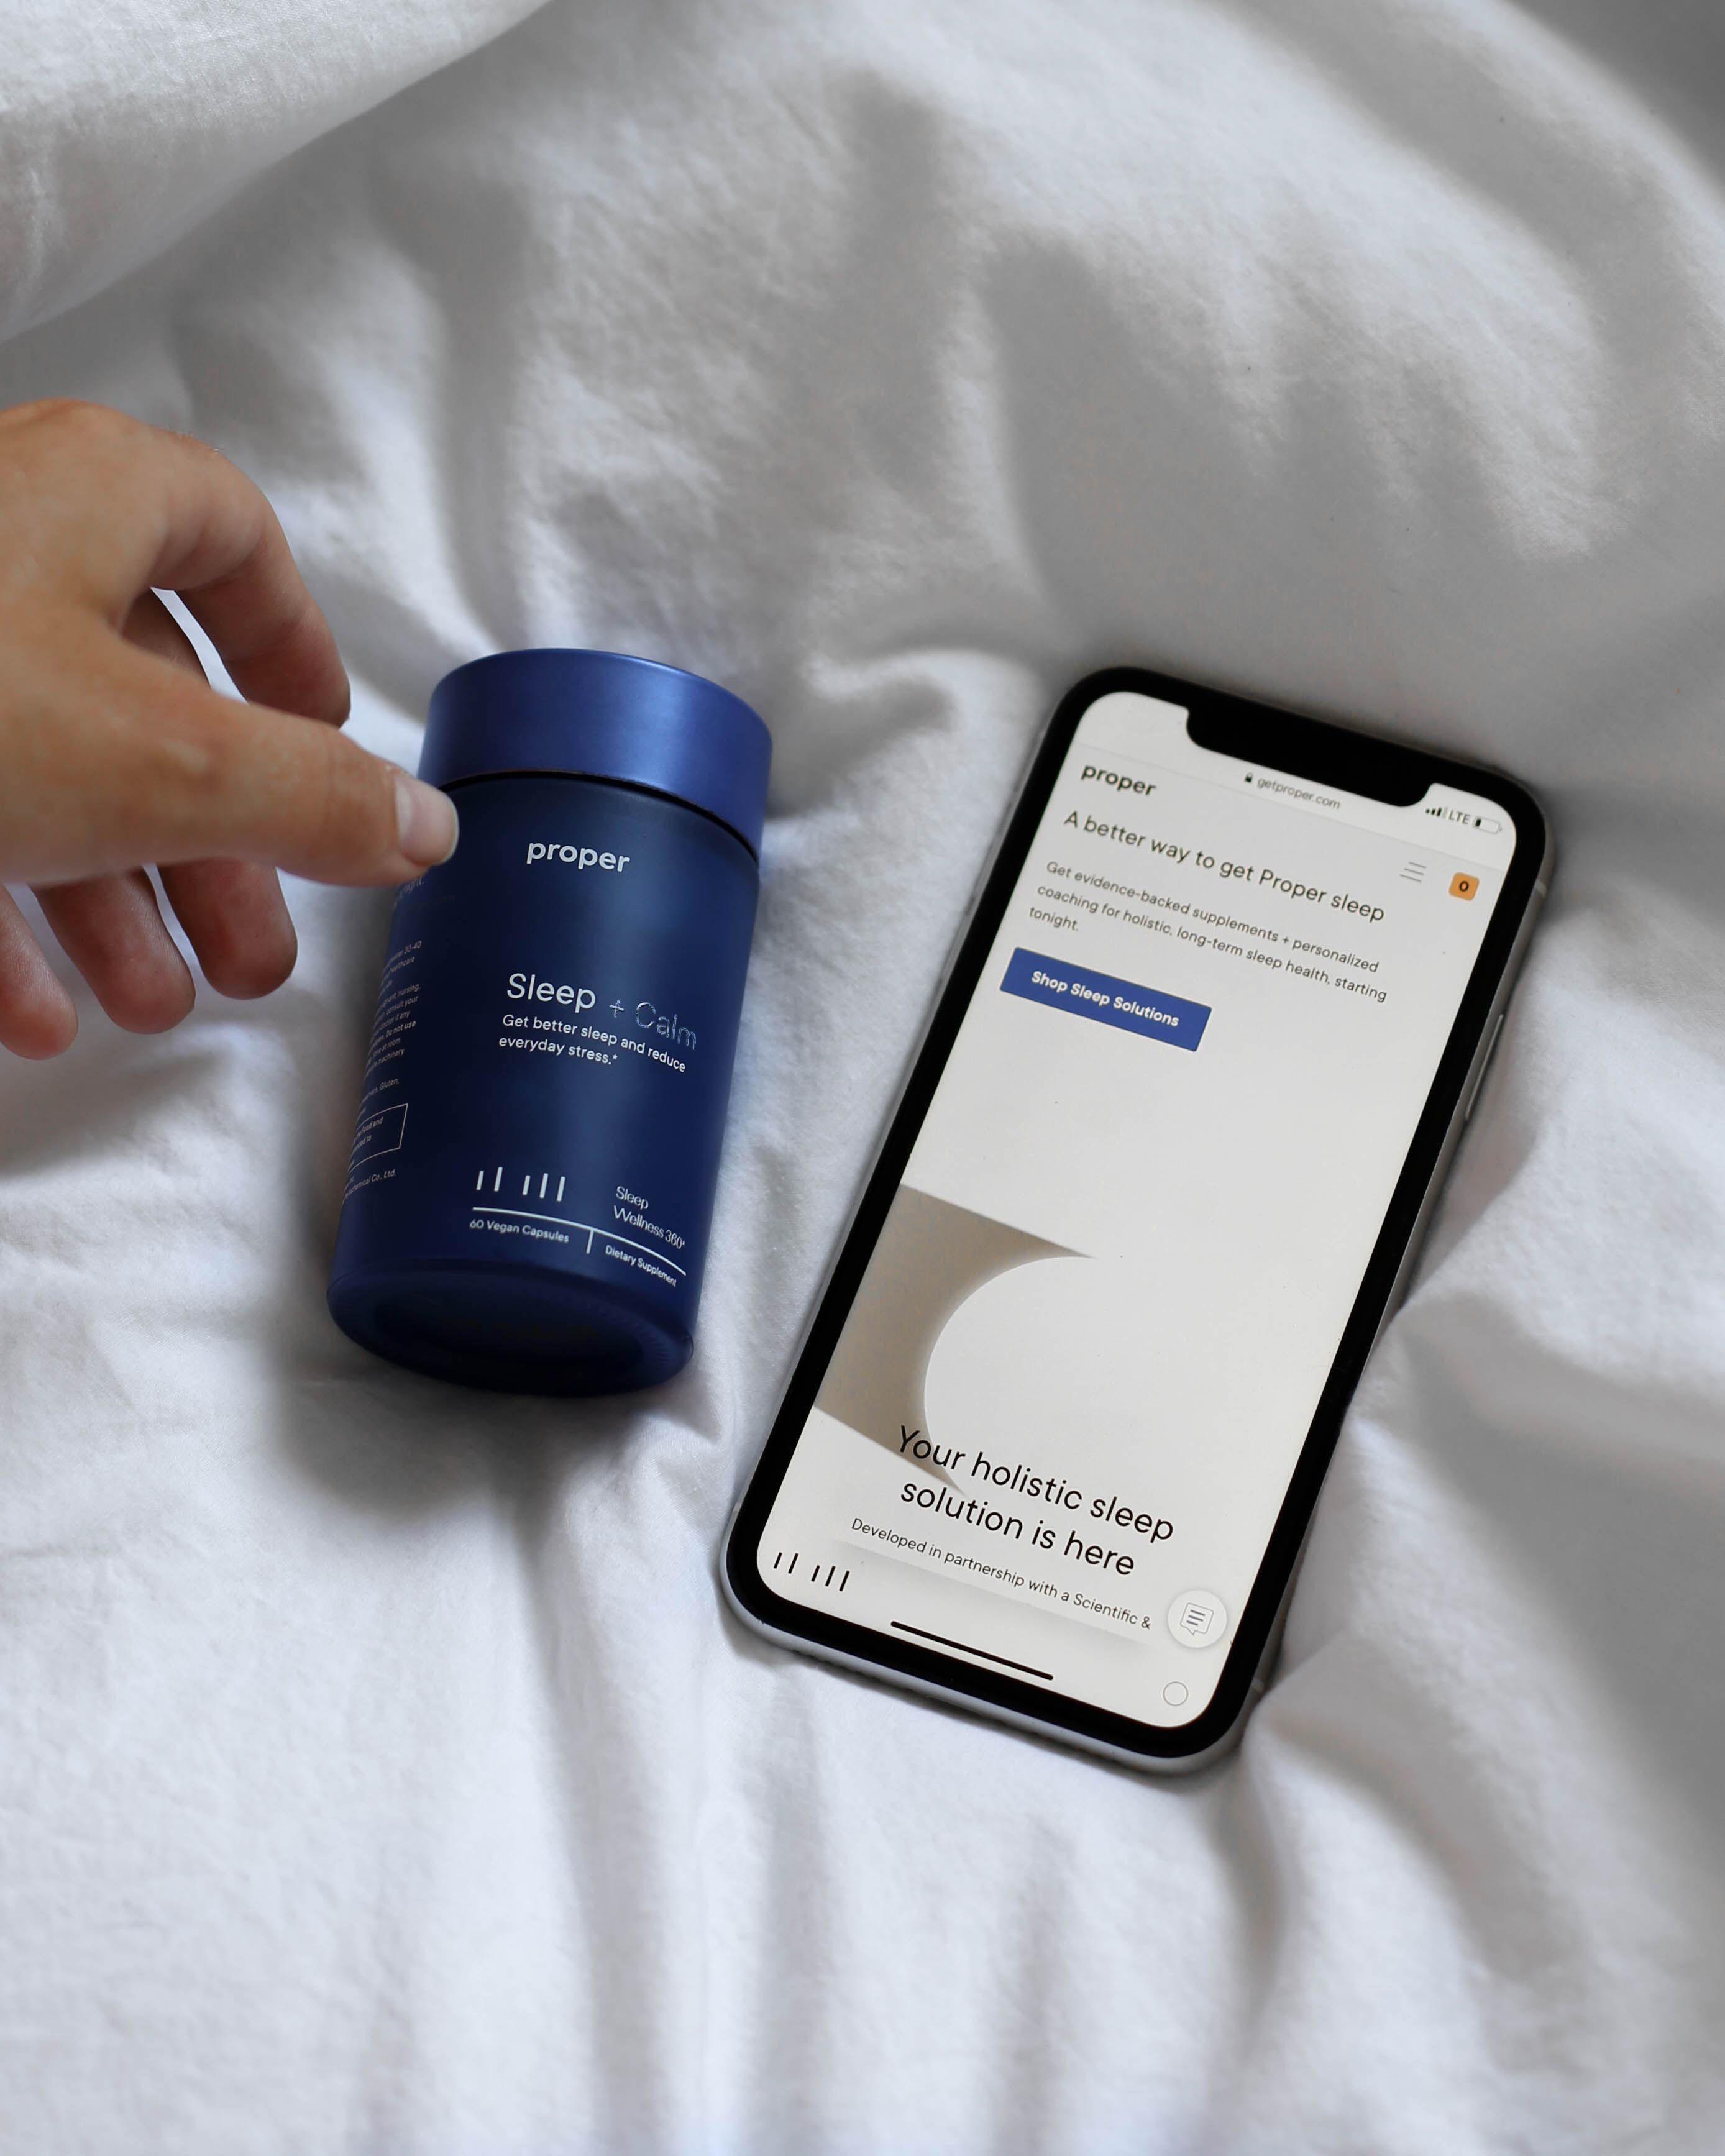 Proper's Commitment | Sleep supplements | Digital Coaching